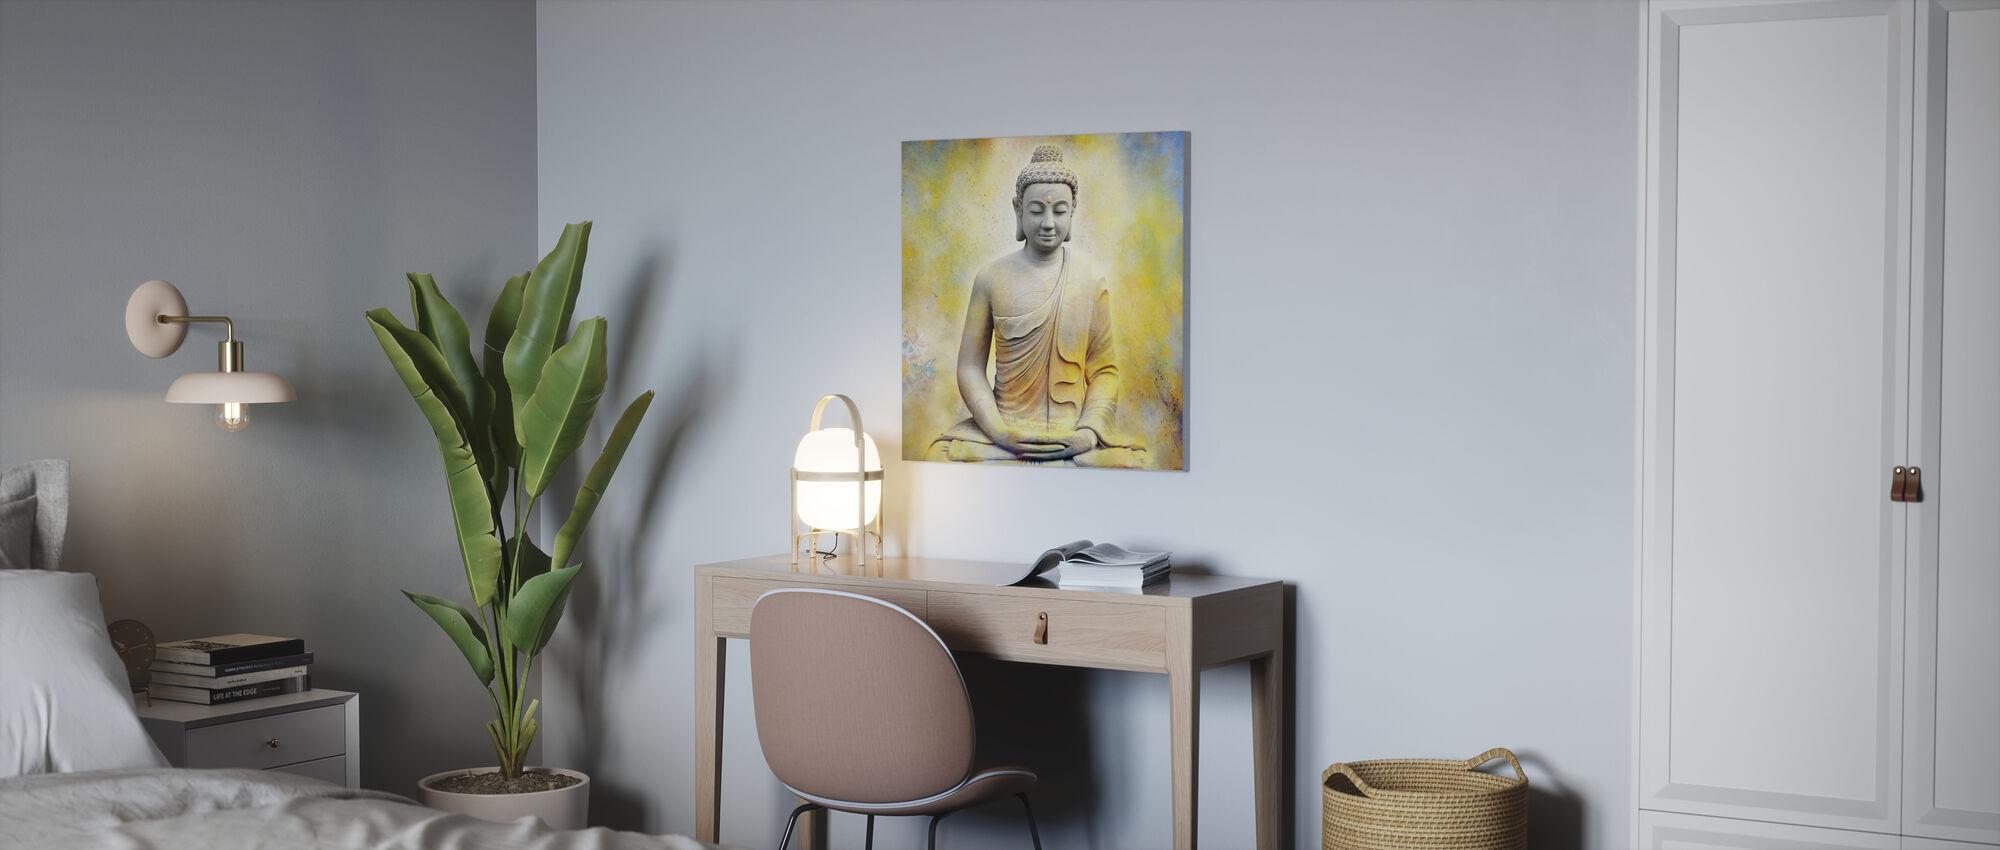 Illumination - Impression sur toile - Bureau